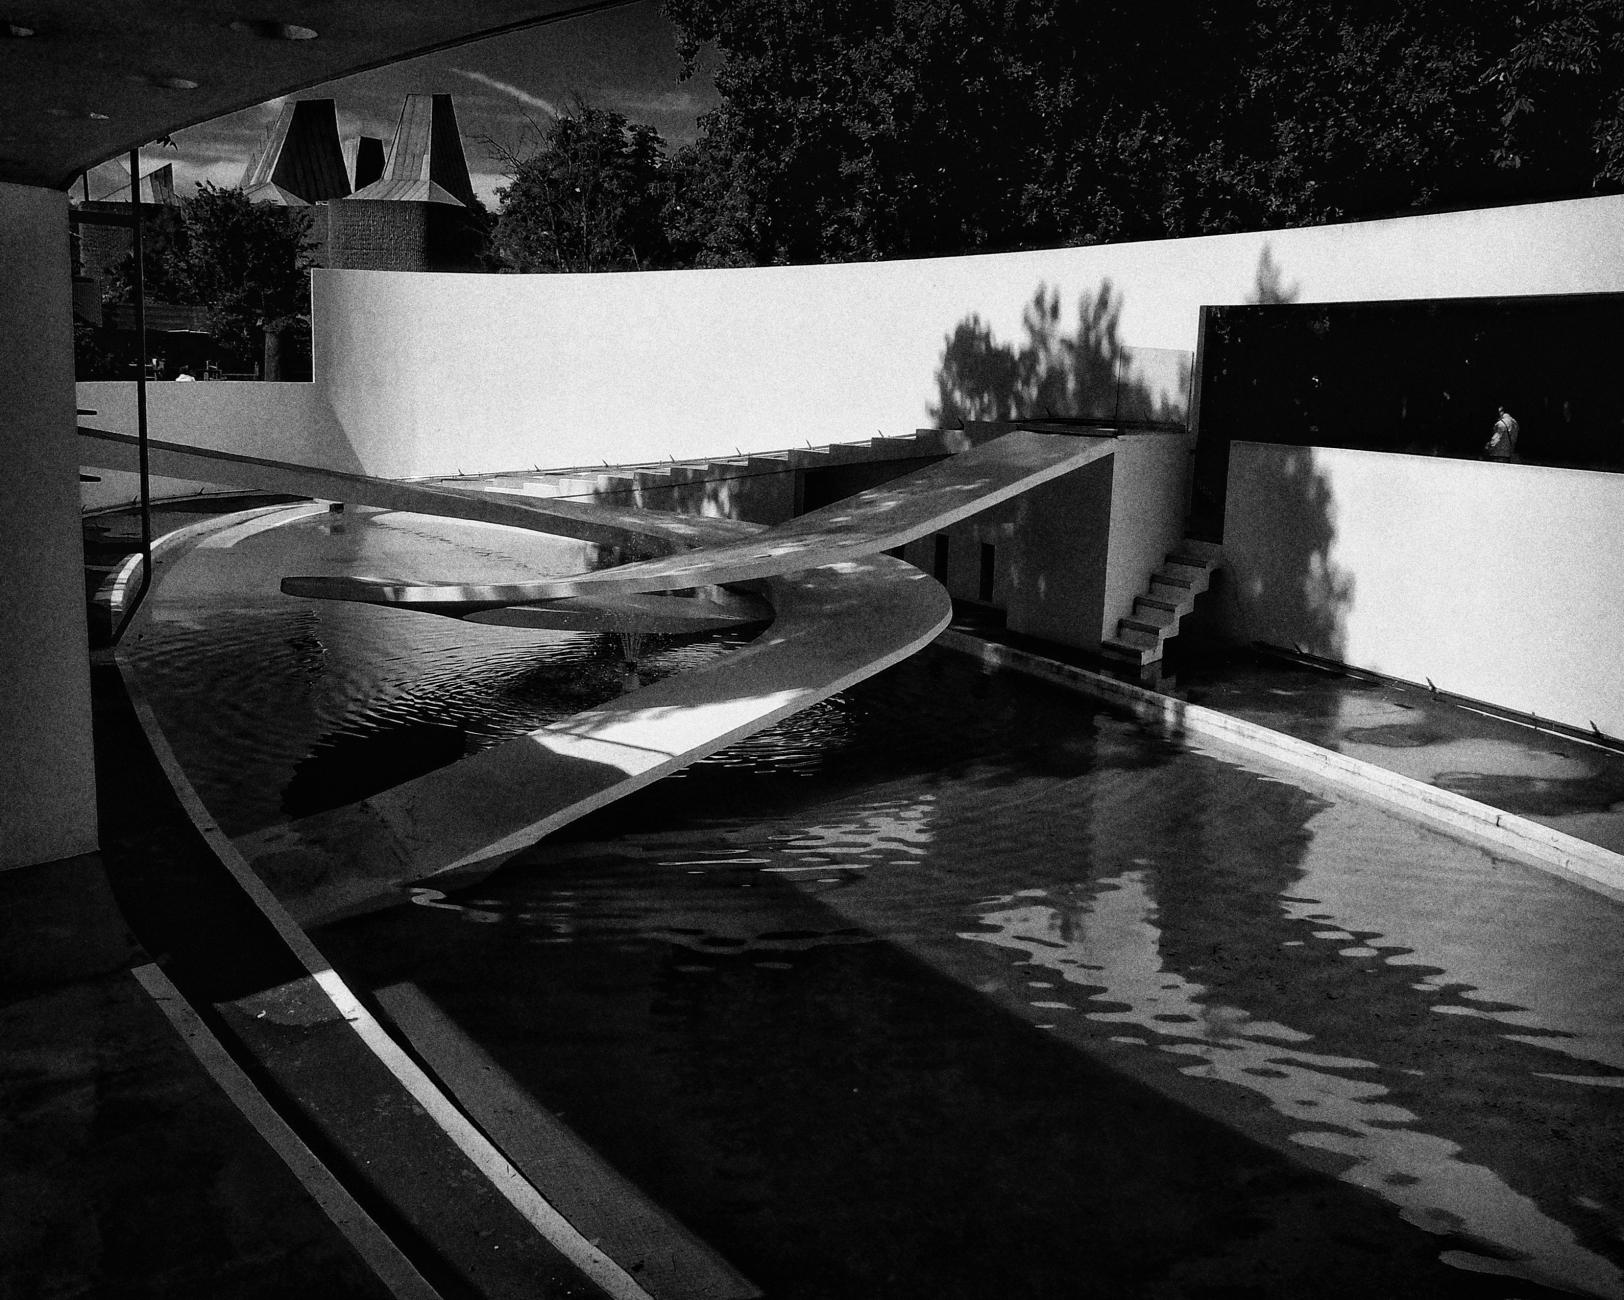 Penguin Pool